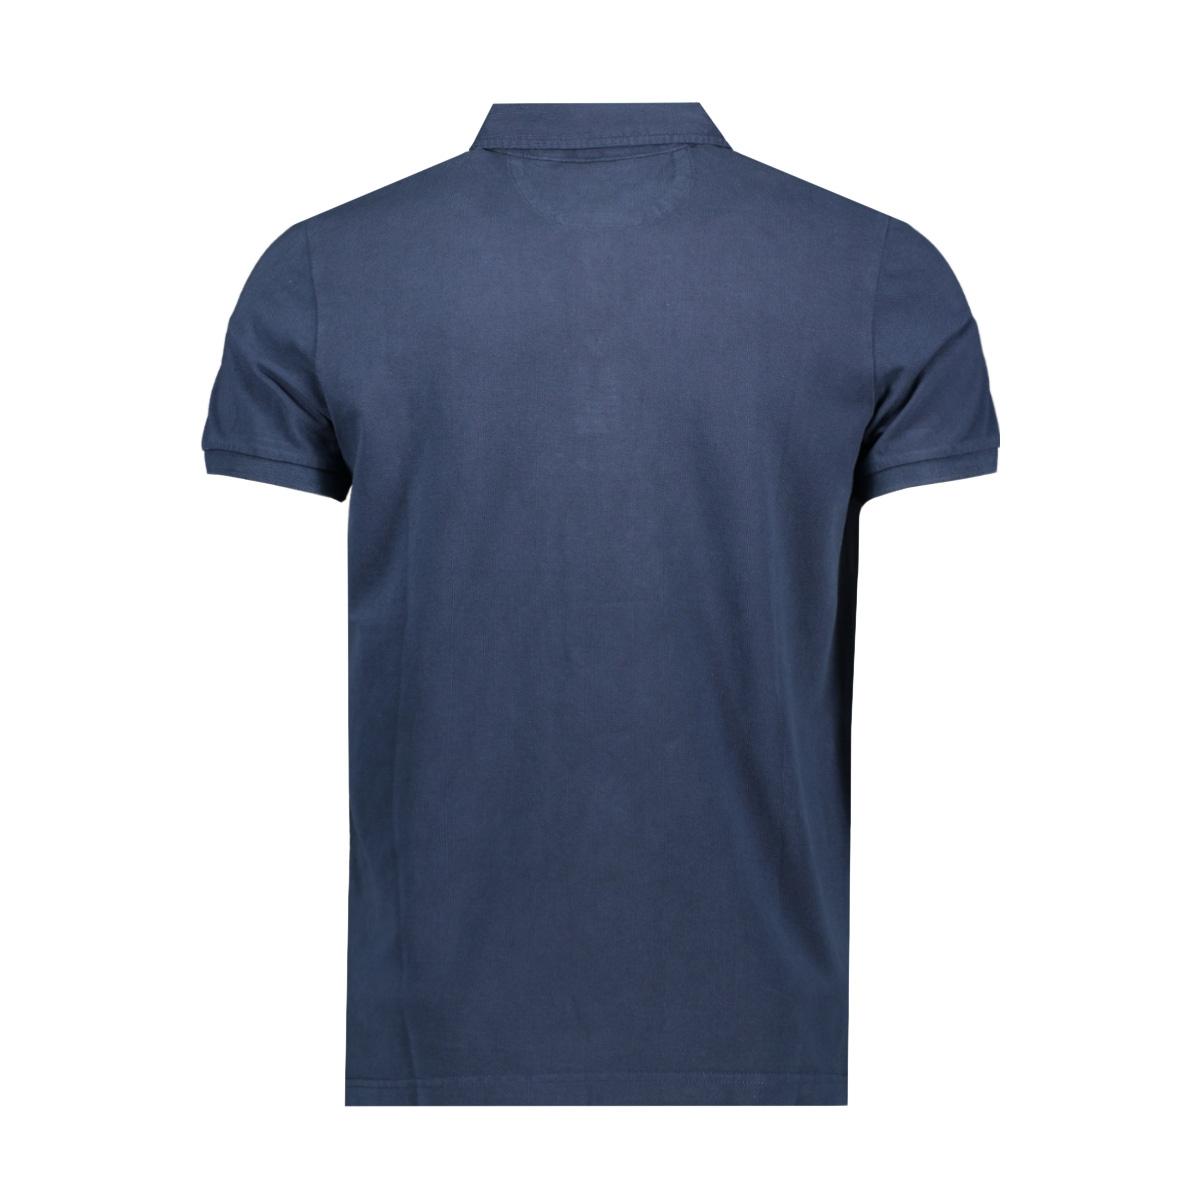 karoro 19cn100 nza polo 282 marine blue